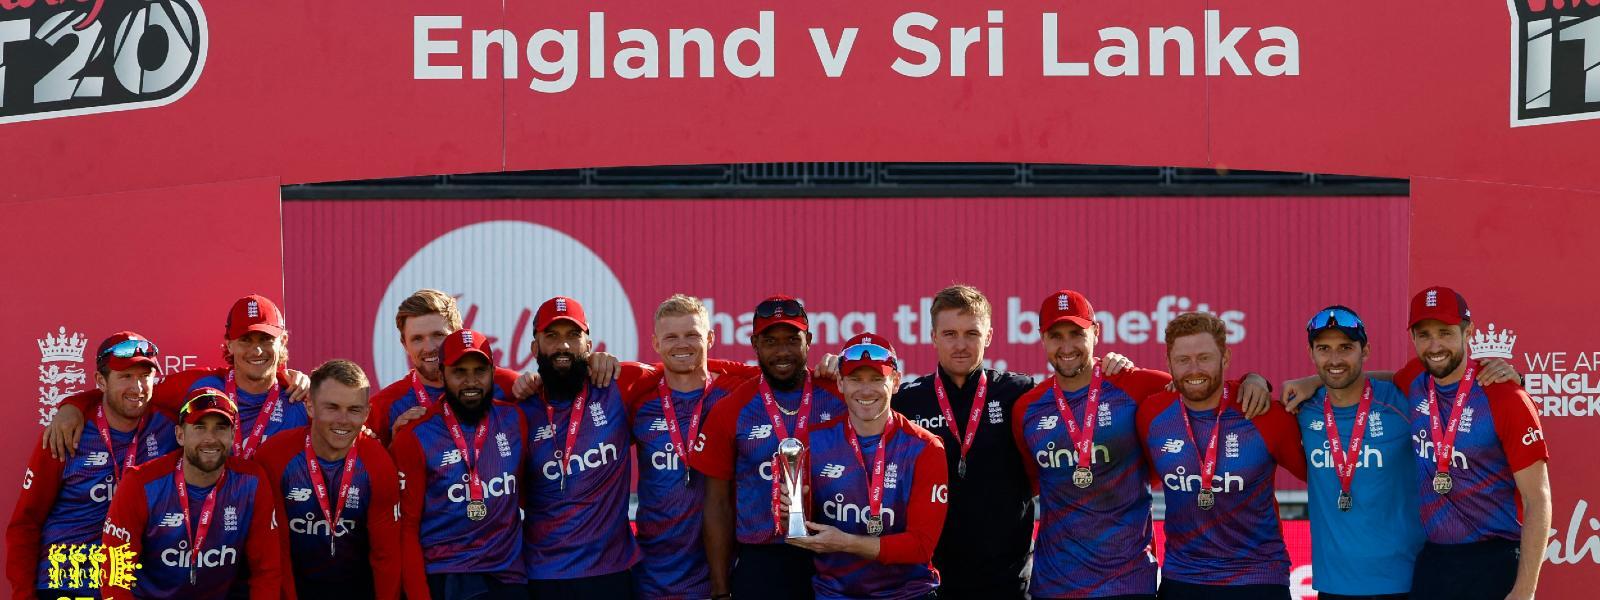 England complete T20 series sweep over Sri Lanka